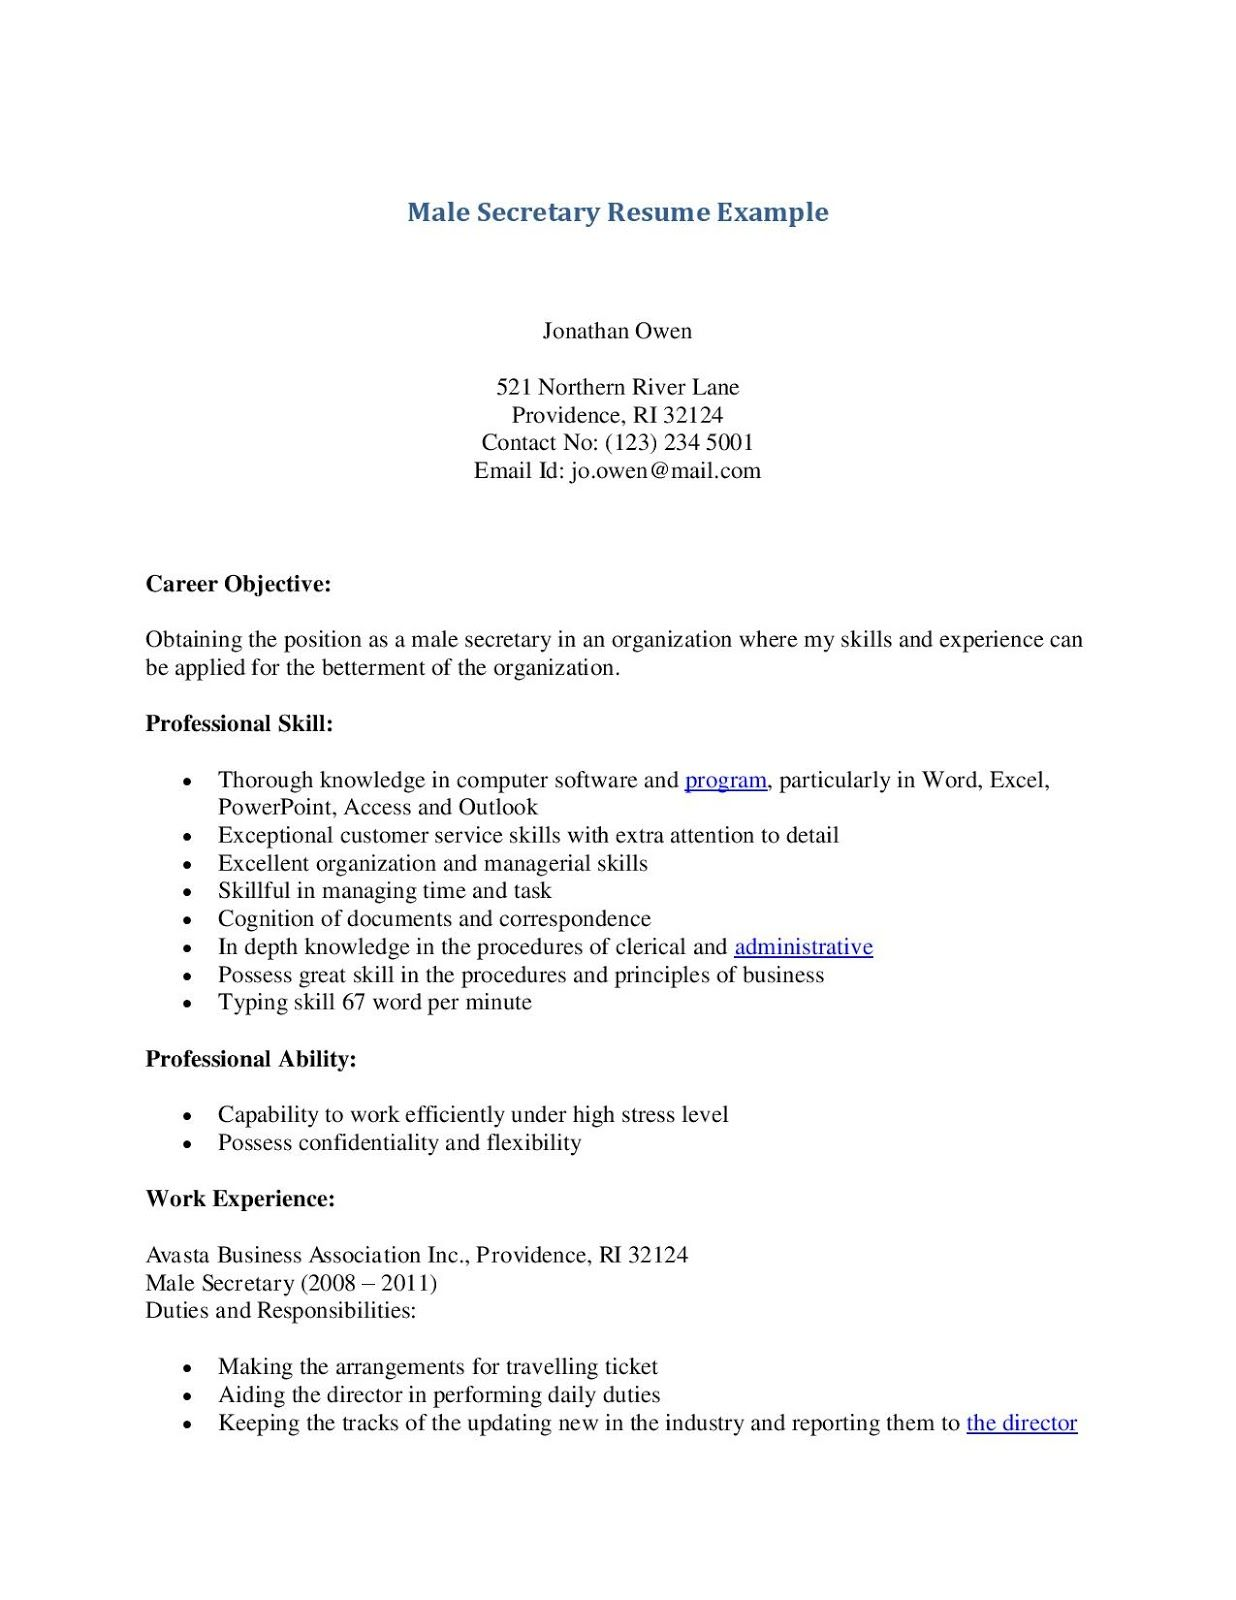 Secretary Resume Examples Secretary Resume Examples 2019 Secretary Resume Examples 2020 Secretary R Resume Examples Job Resume Examples Best Resume Template